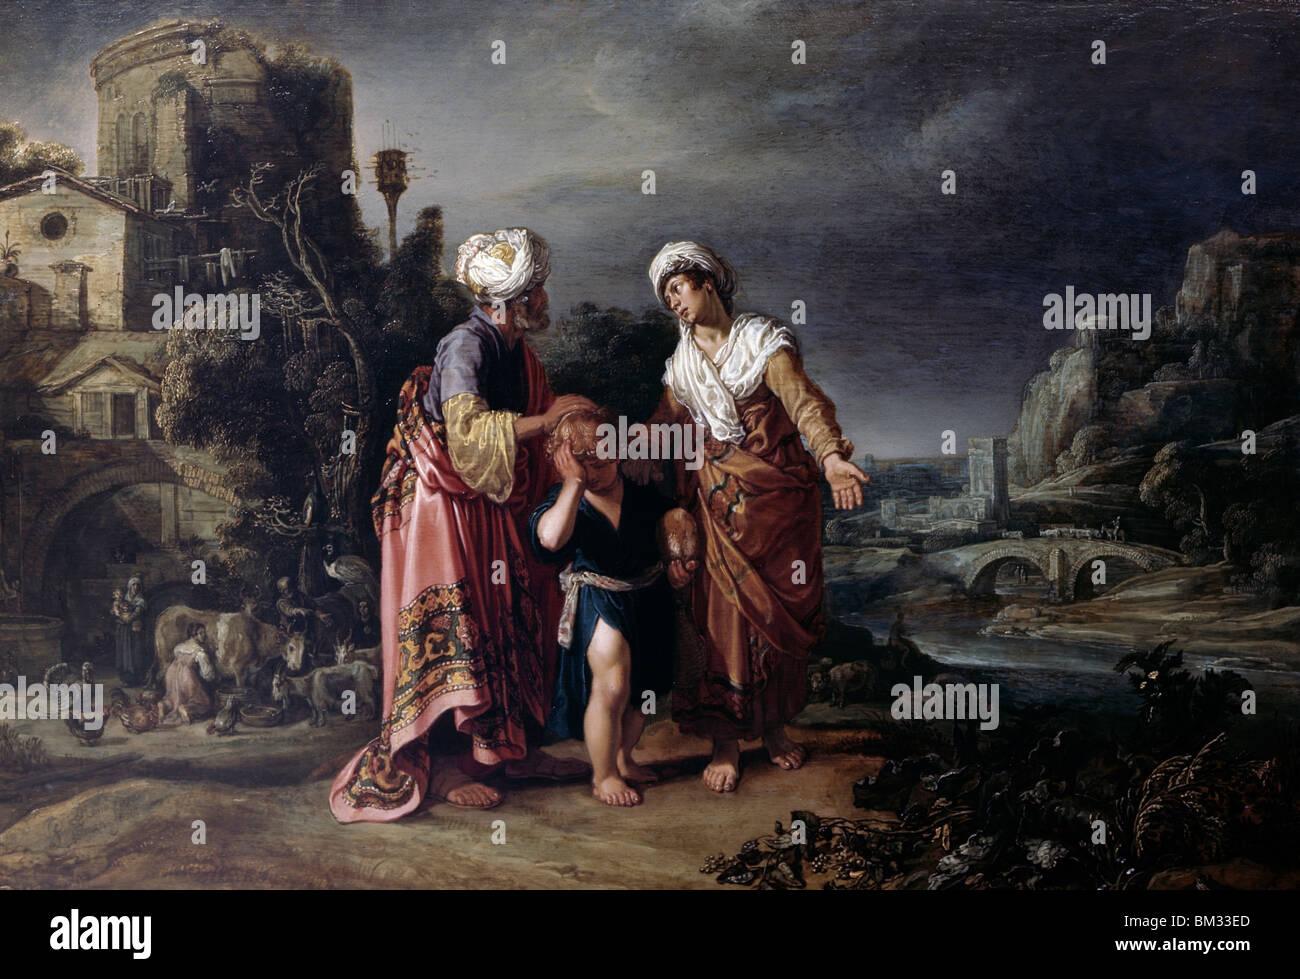 Hagar's Expulsion by Pieter Lastman, (1583-1633) - Stock Image